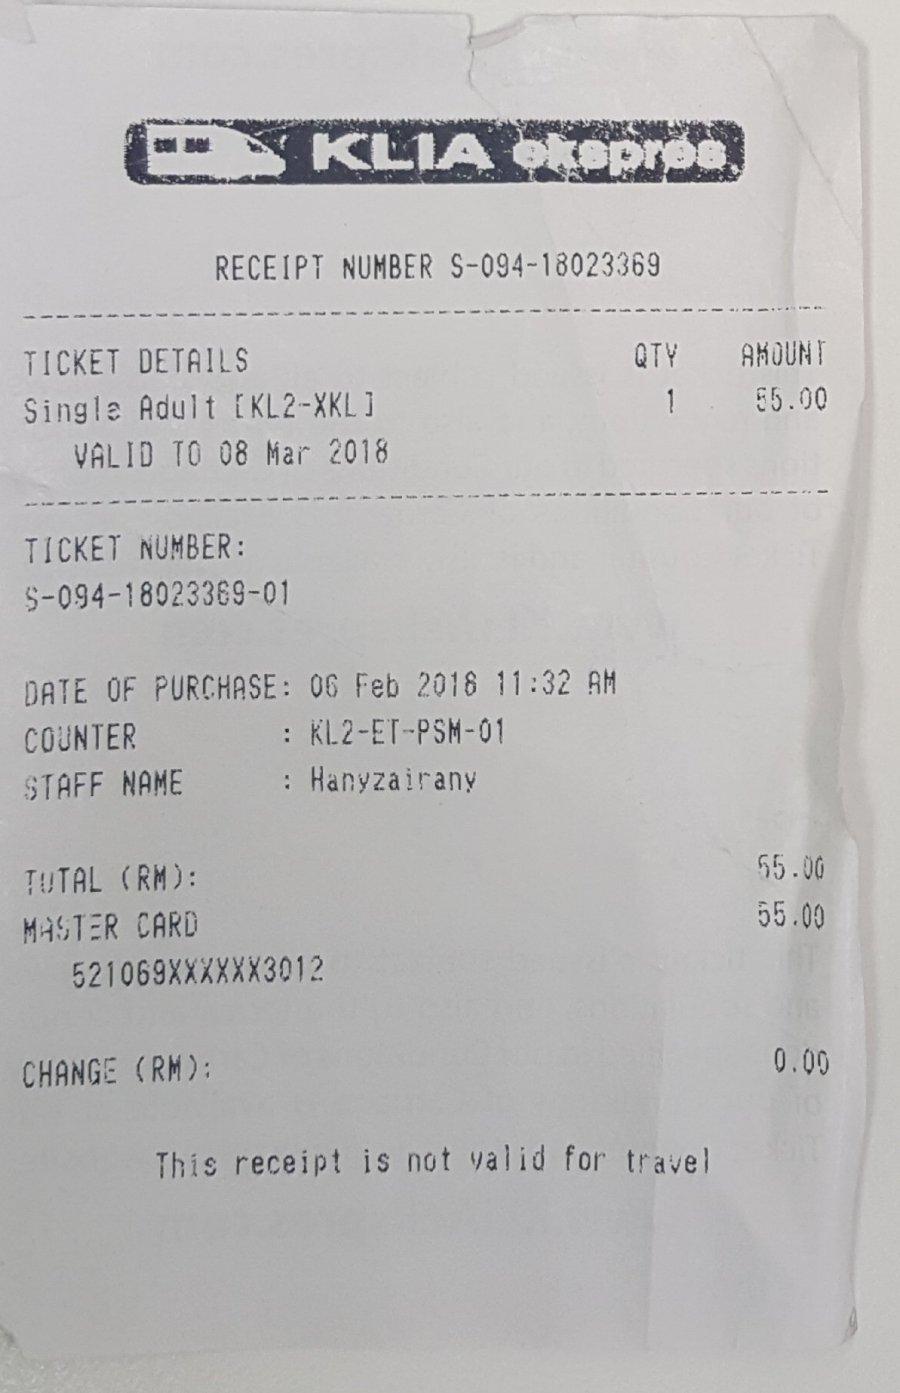 KLIA Express Train One Way Ticket costs MYR 55.00